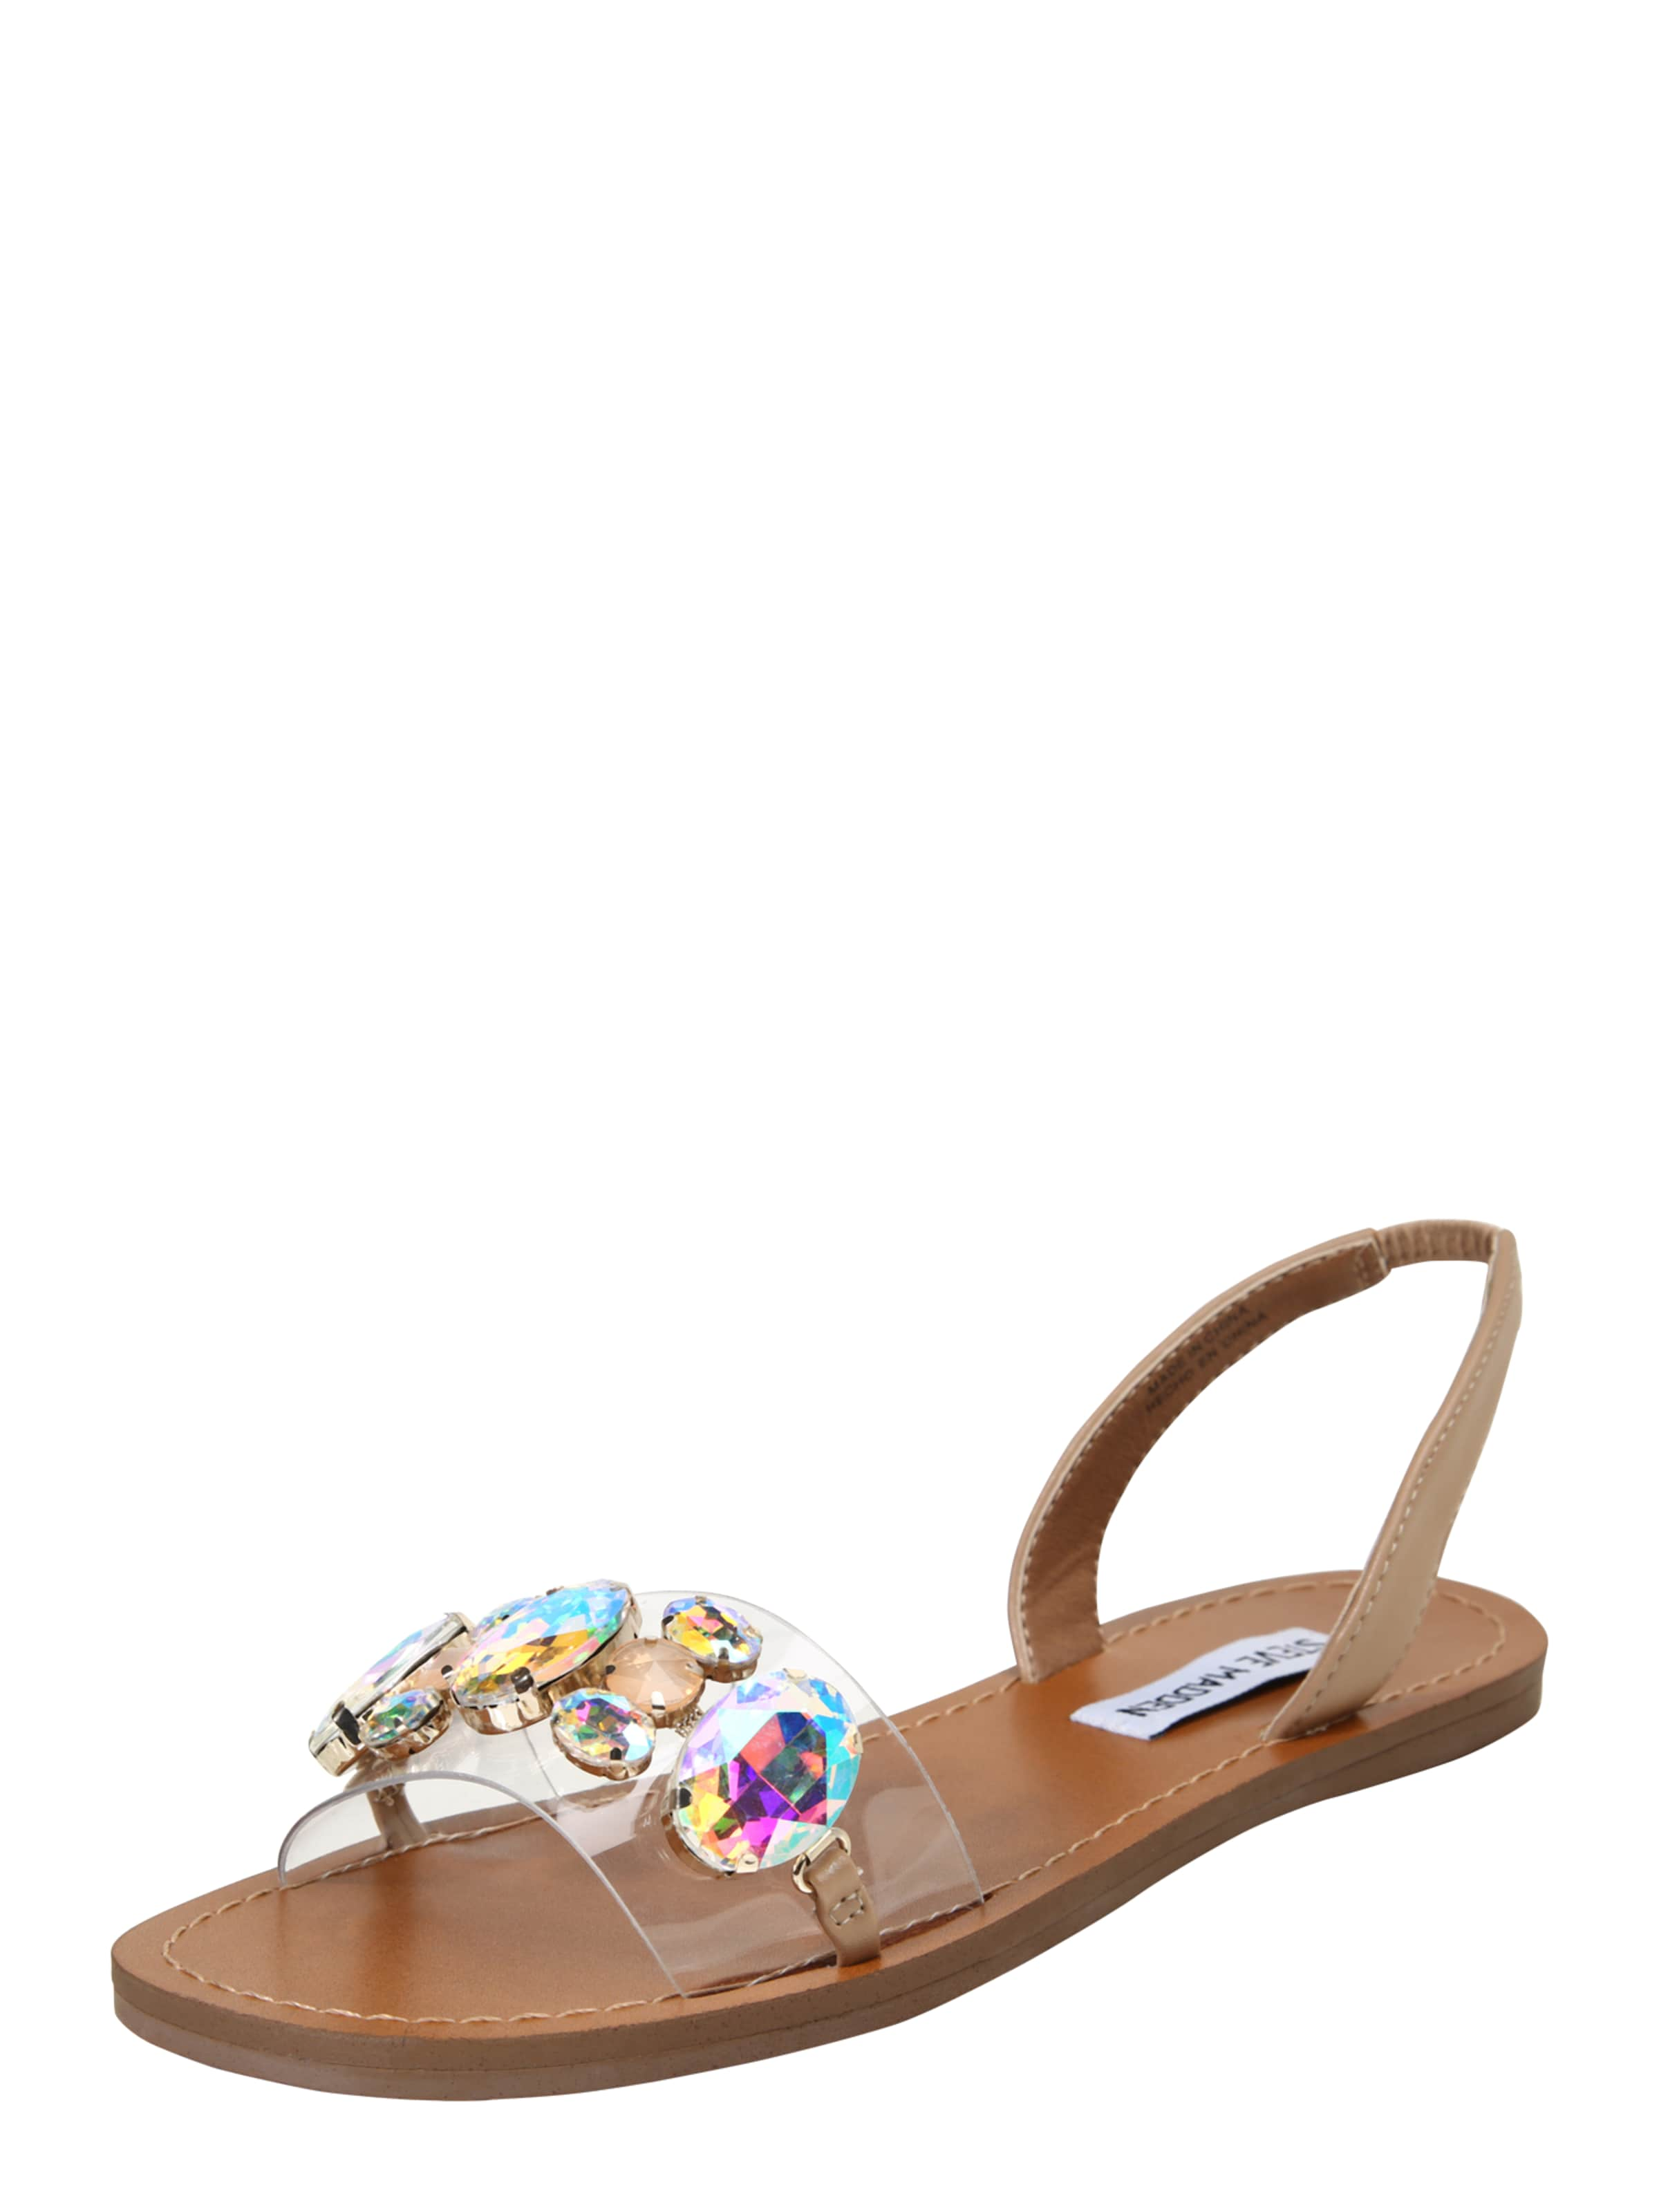 STEVE Sandalette MADDEN | Sandalette STEVE mit Ziersteinen  ALICE c0a68a